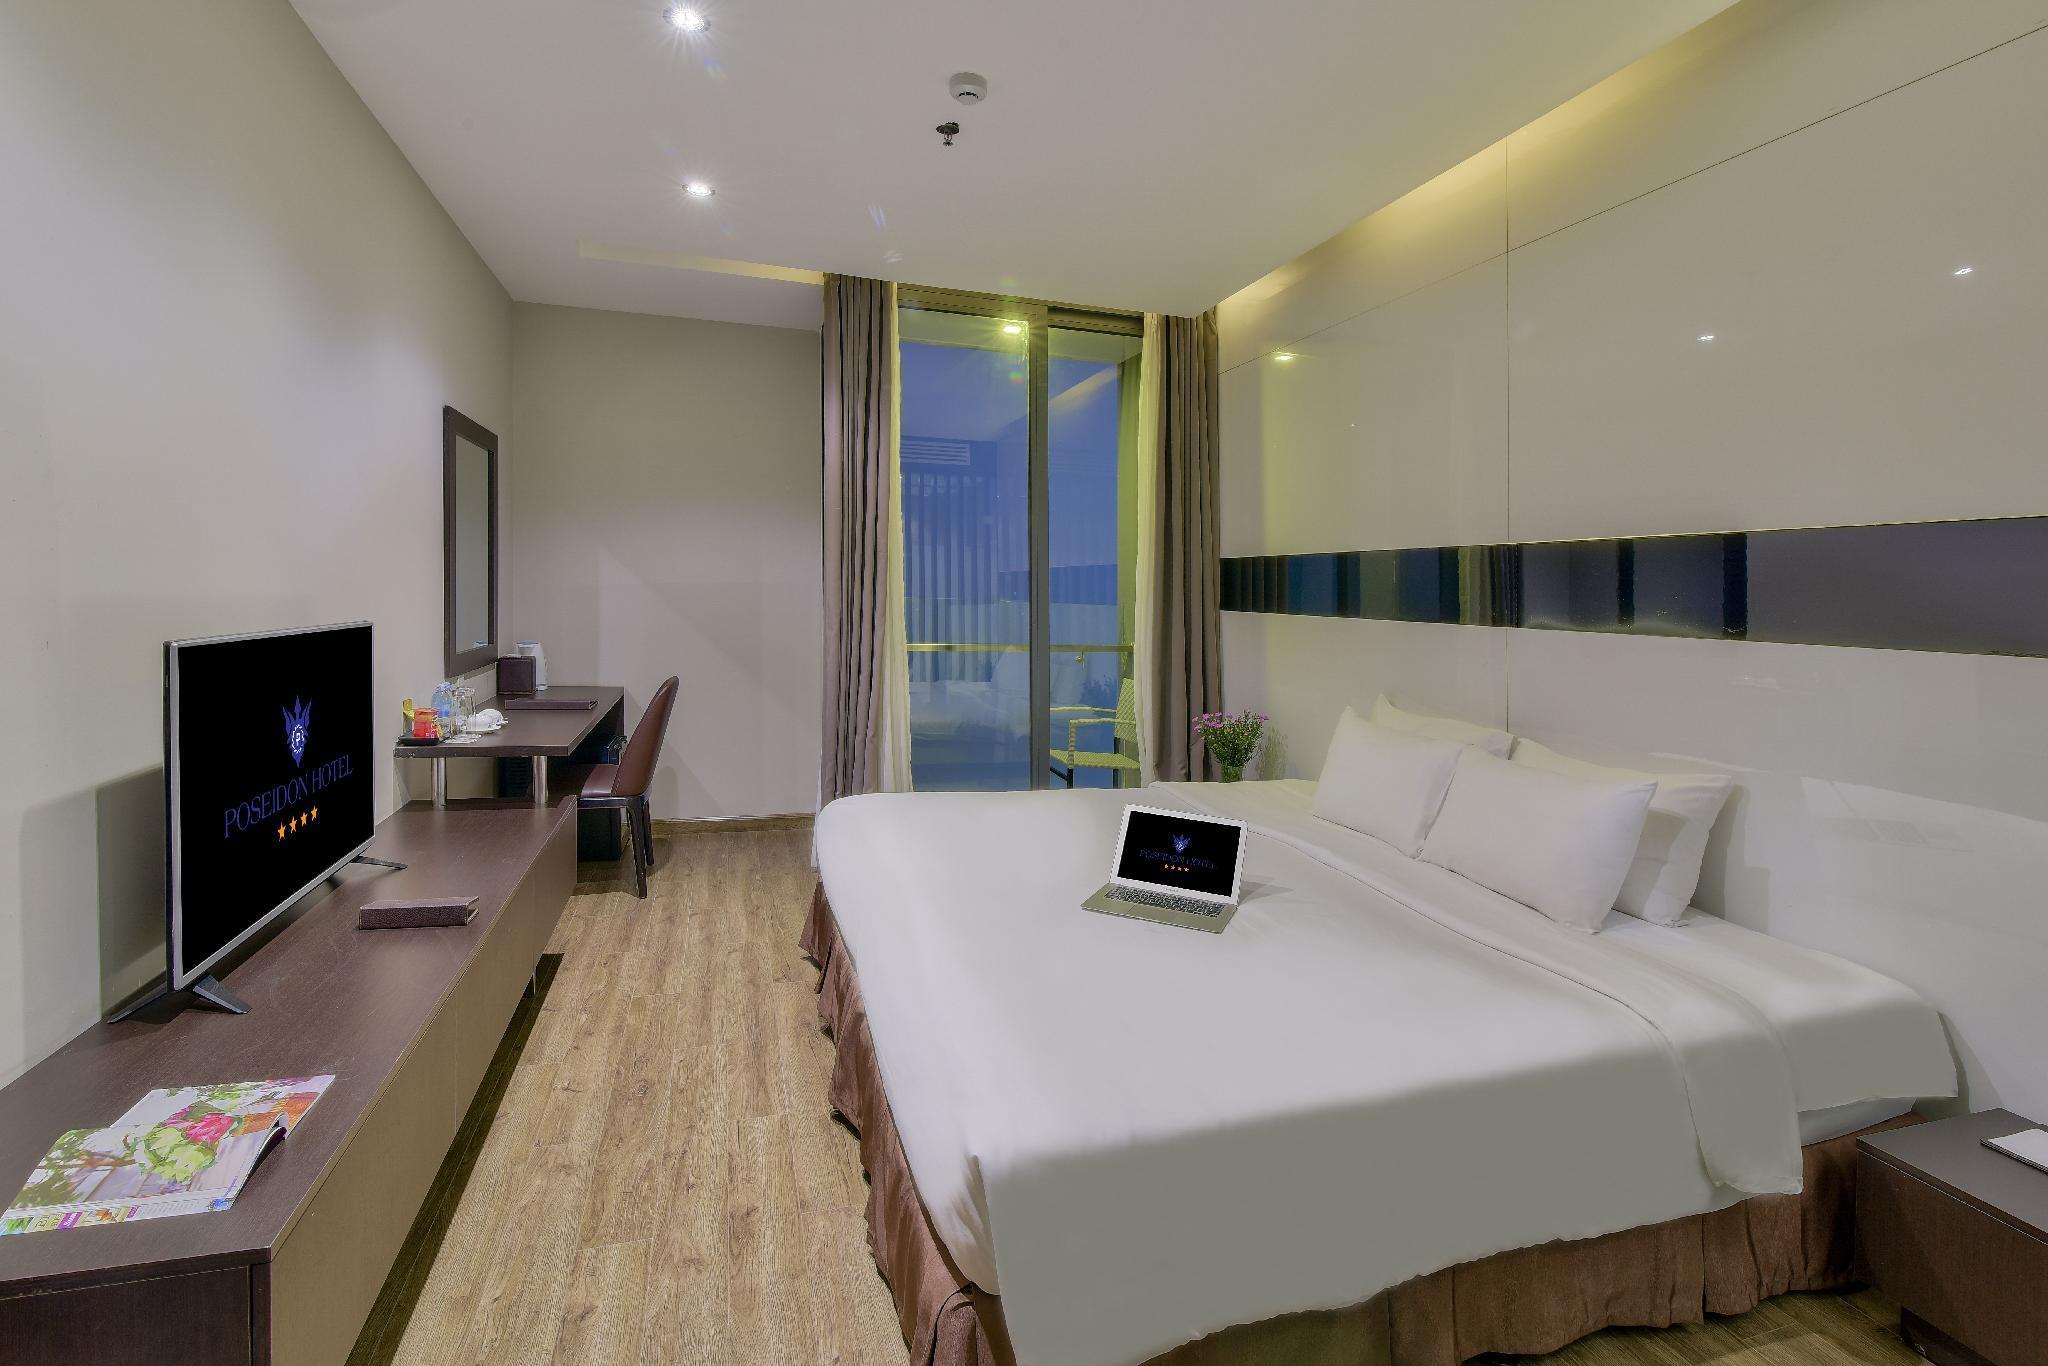 Poseidon Nha Trang Hotel Vietnam 2019 Reviews Pictures